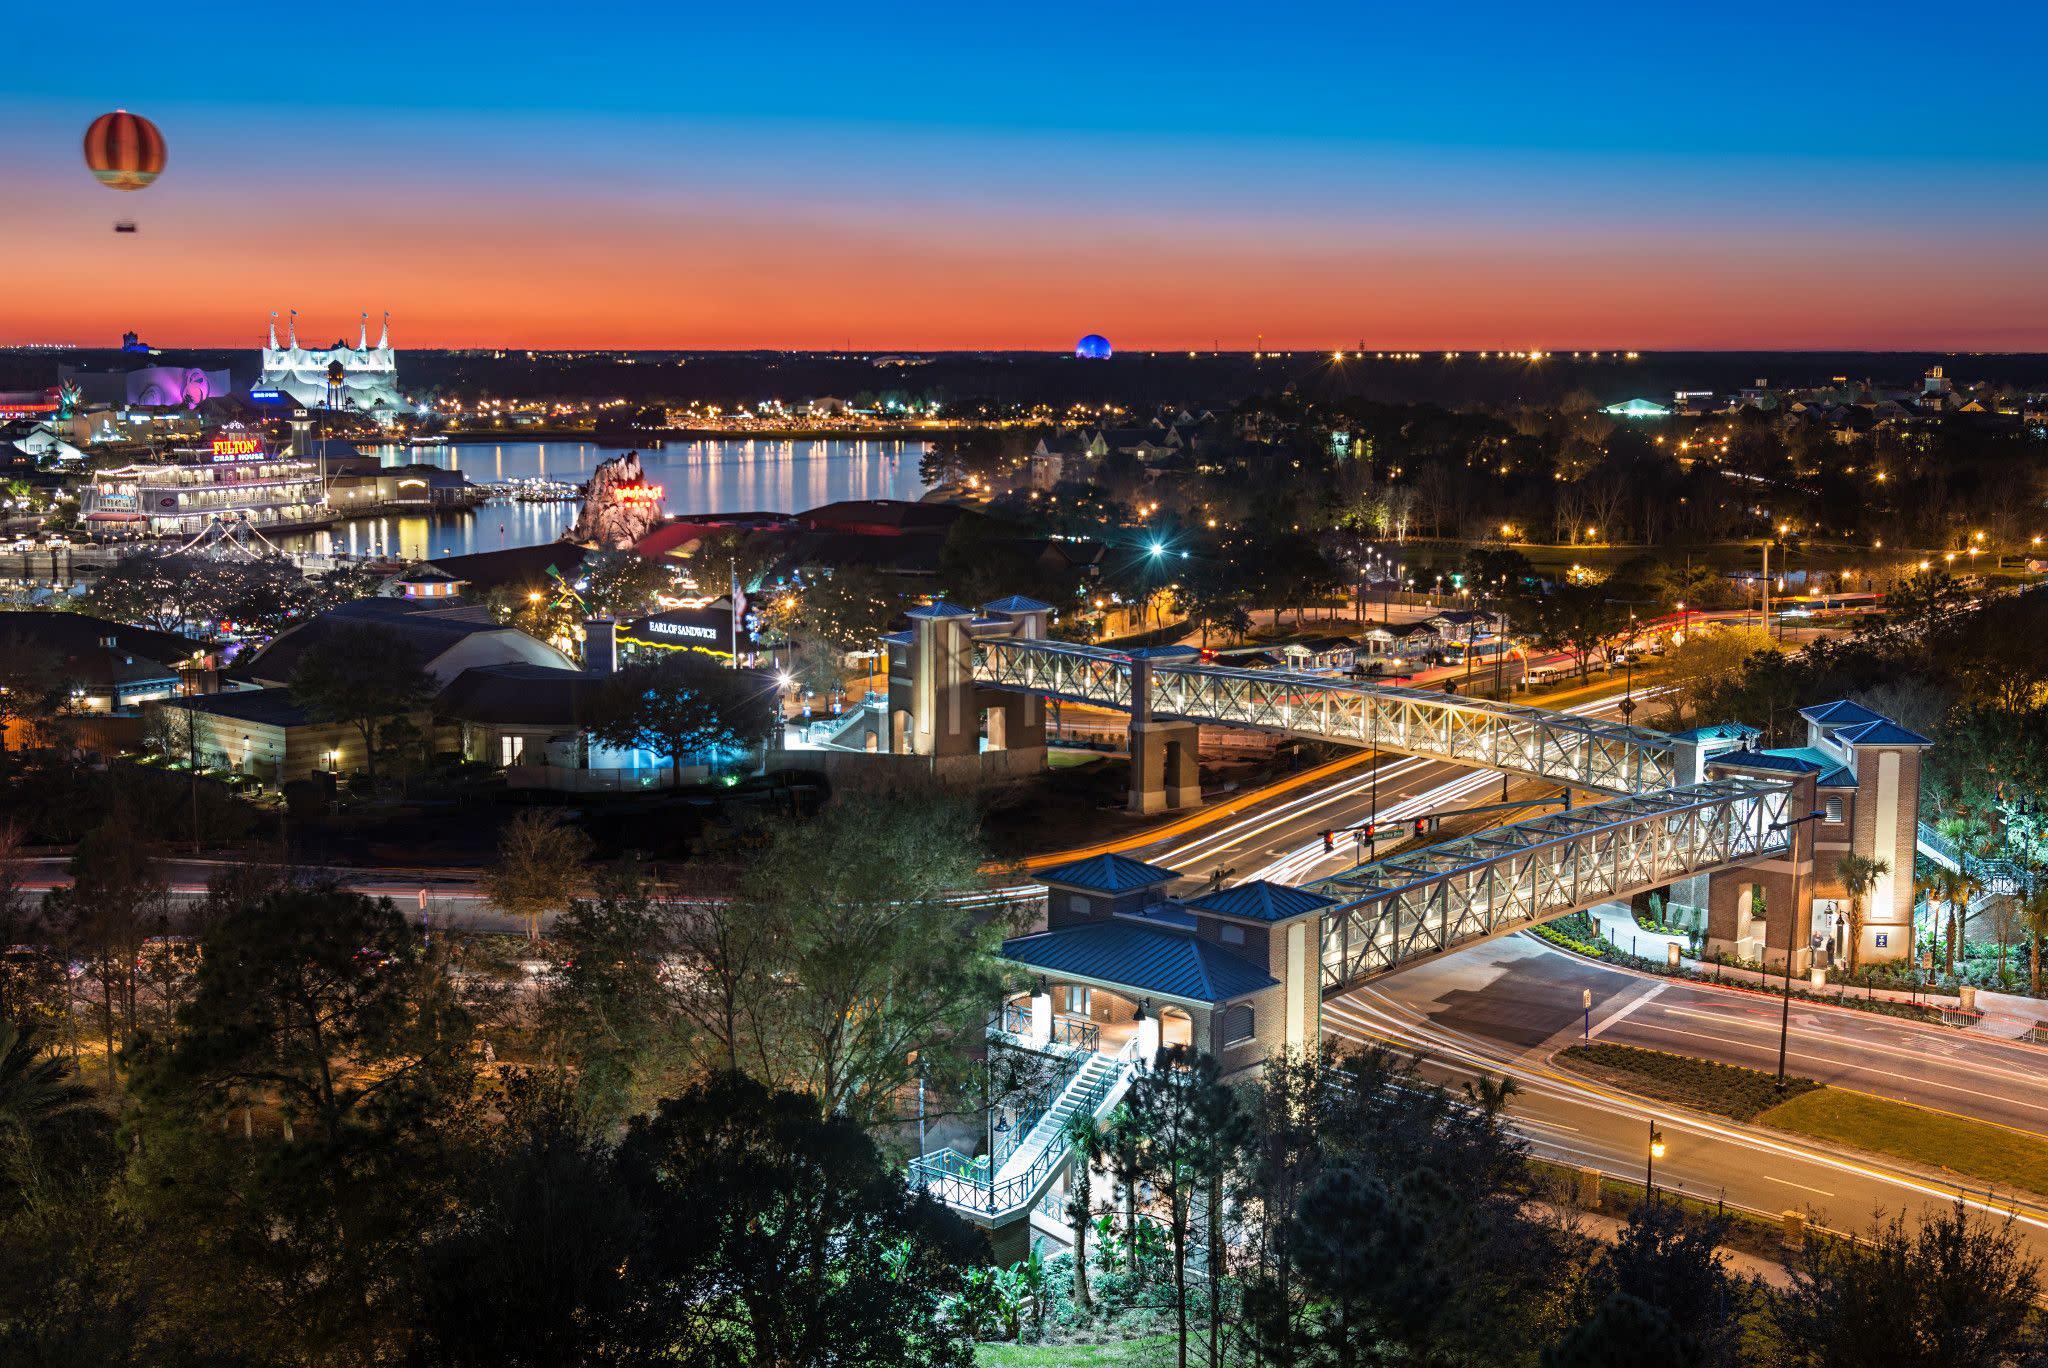 Disney Springs in Orlando